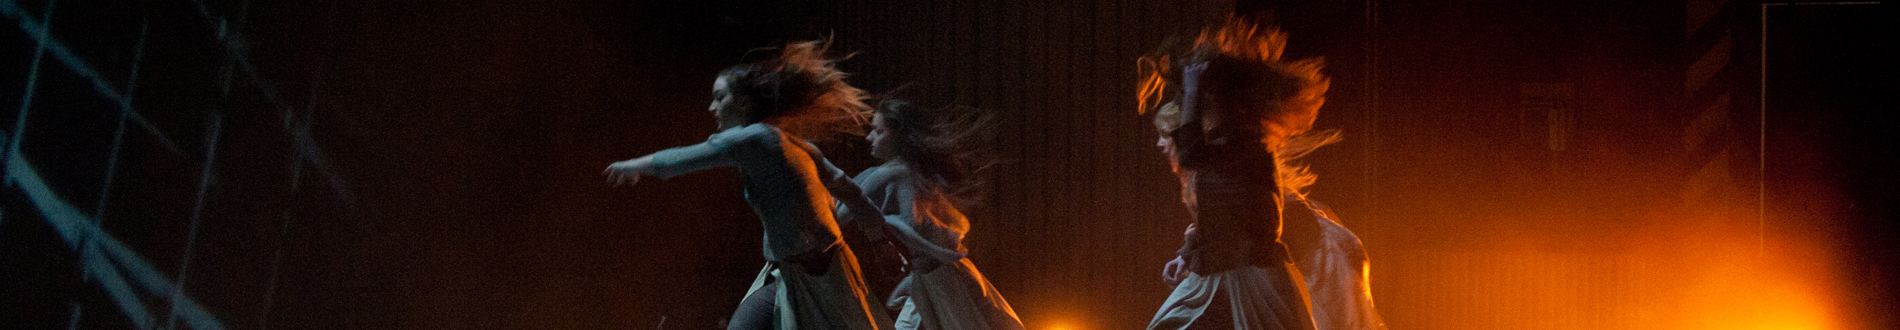 Liptovské divadlo tanca Liptovský Hrádok